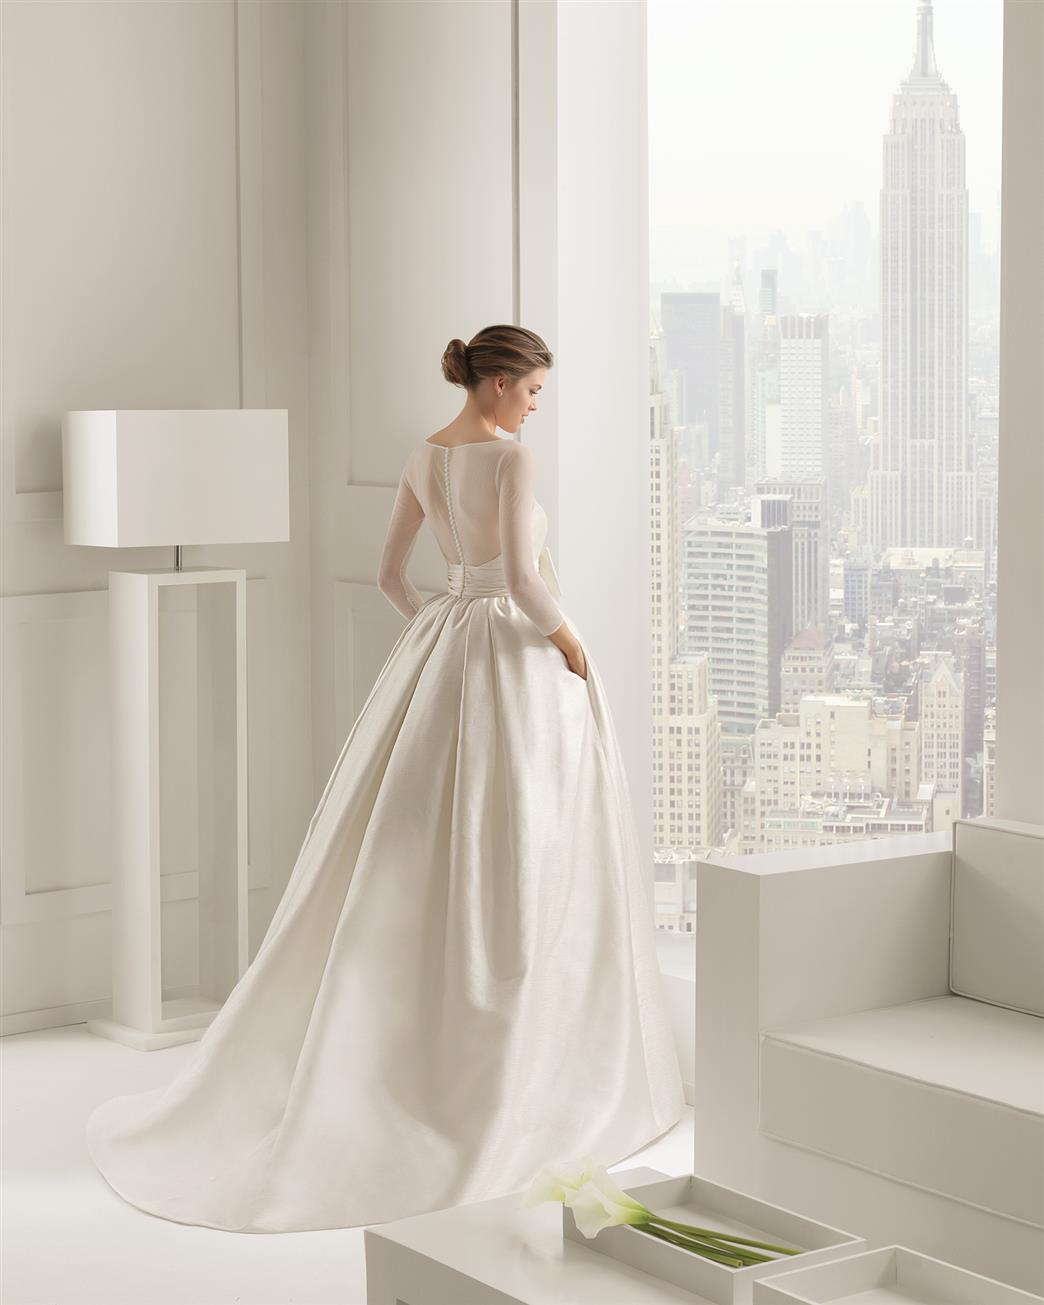 Long Sleeve Wedding Dress from Rosa Clara 2015 Collection - Segovia